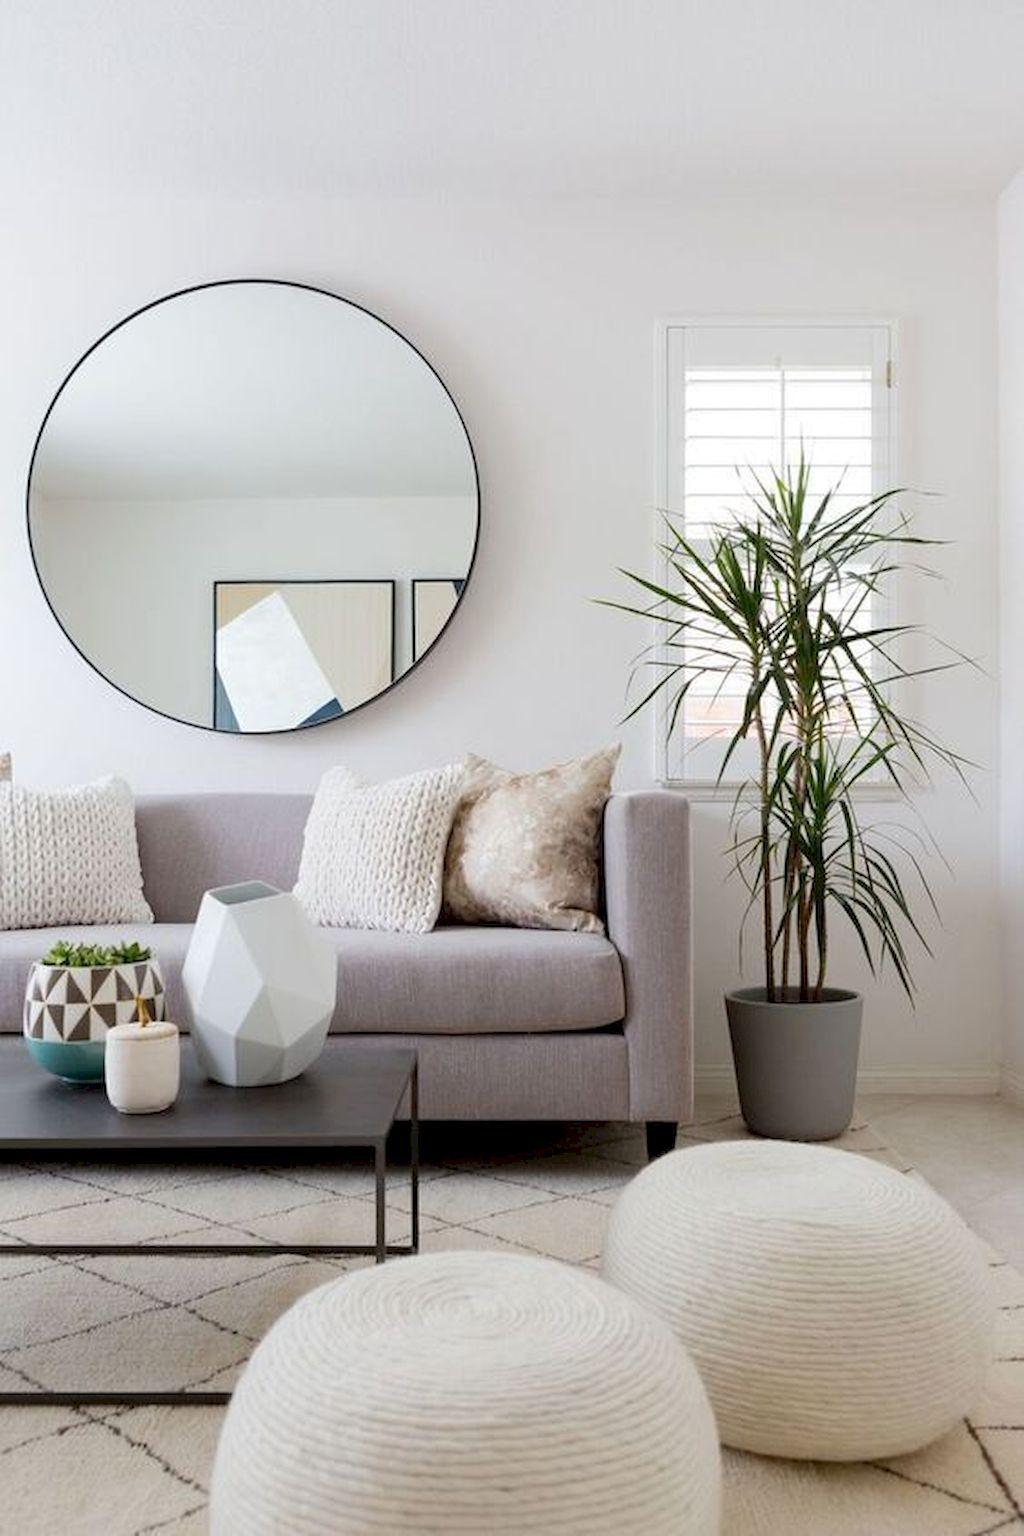 55 Modern Small Living Room Decor Ideas | Pinterest | Small living ...